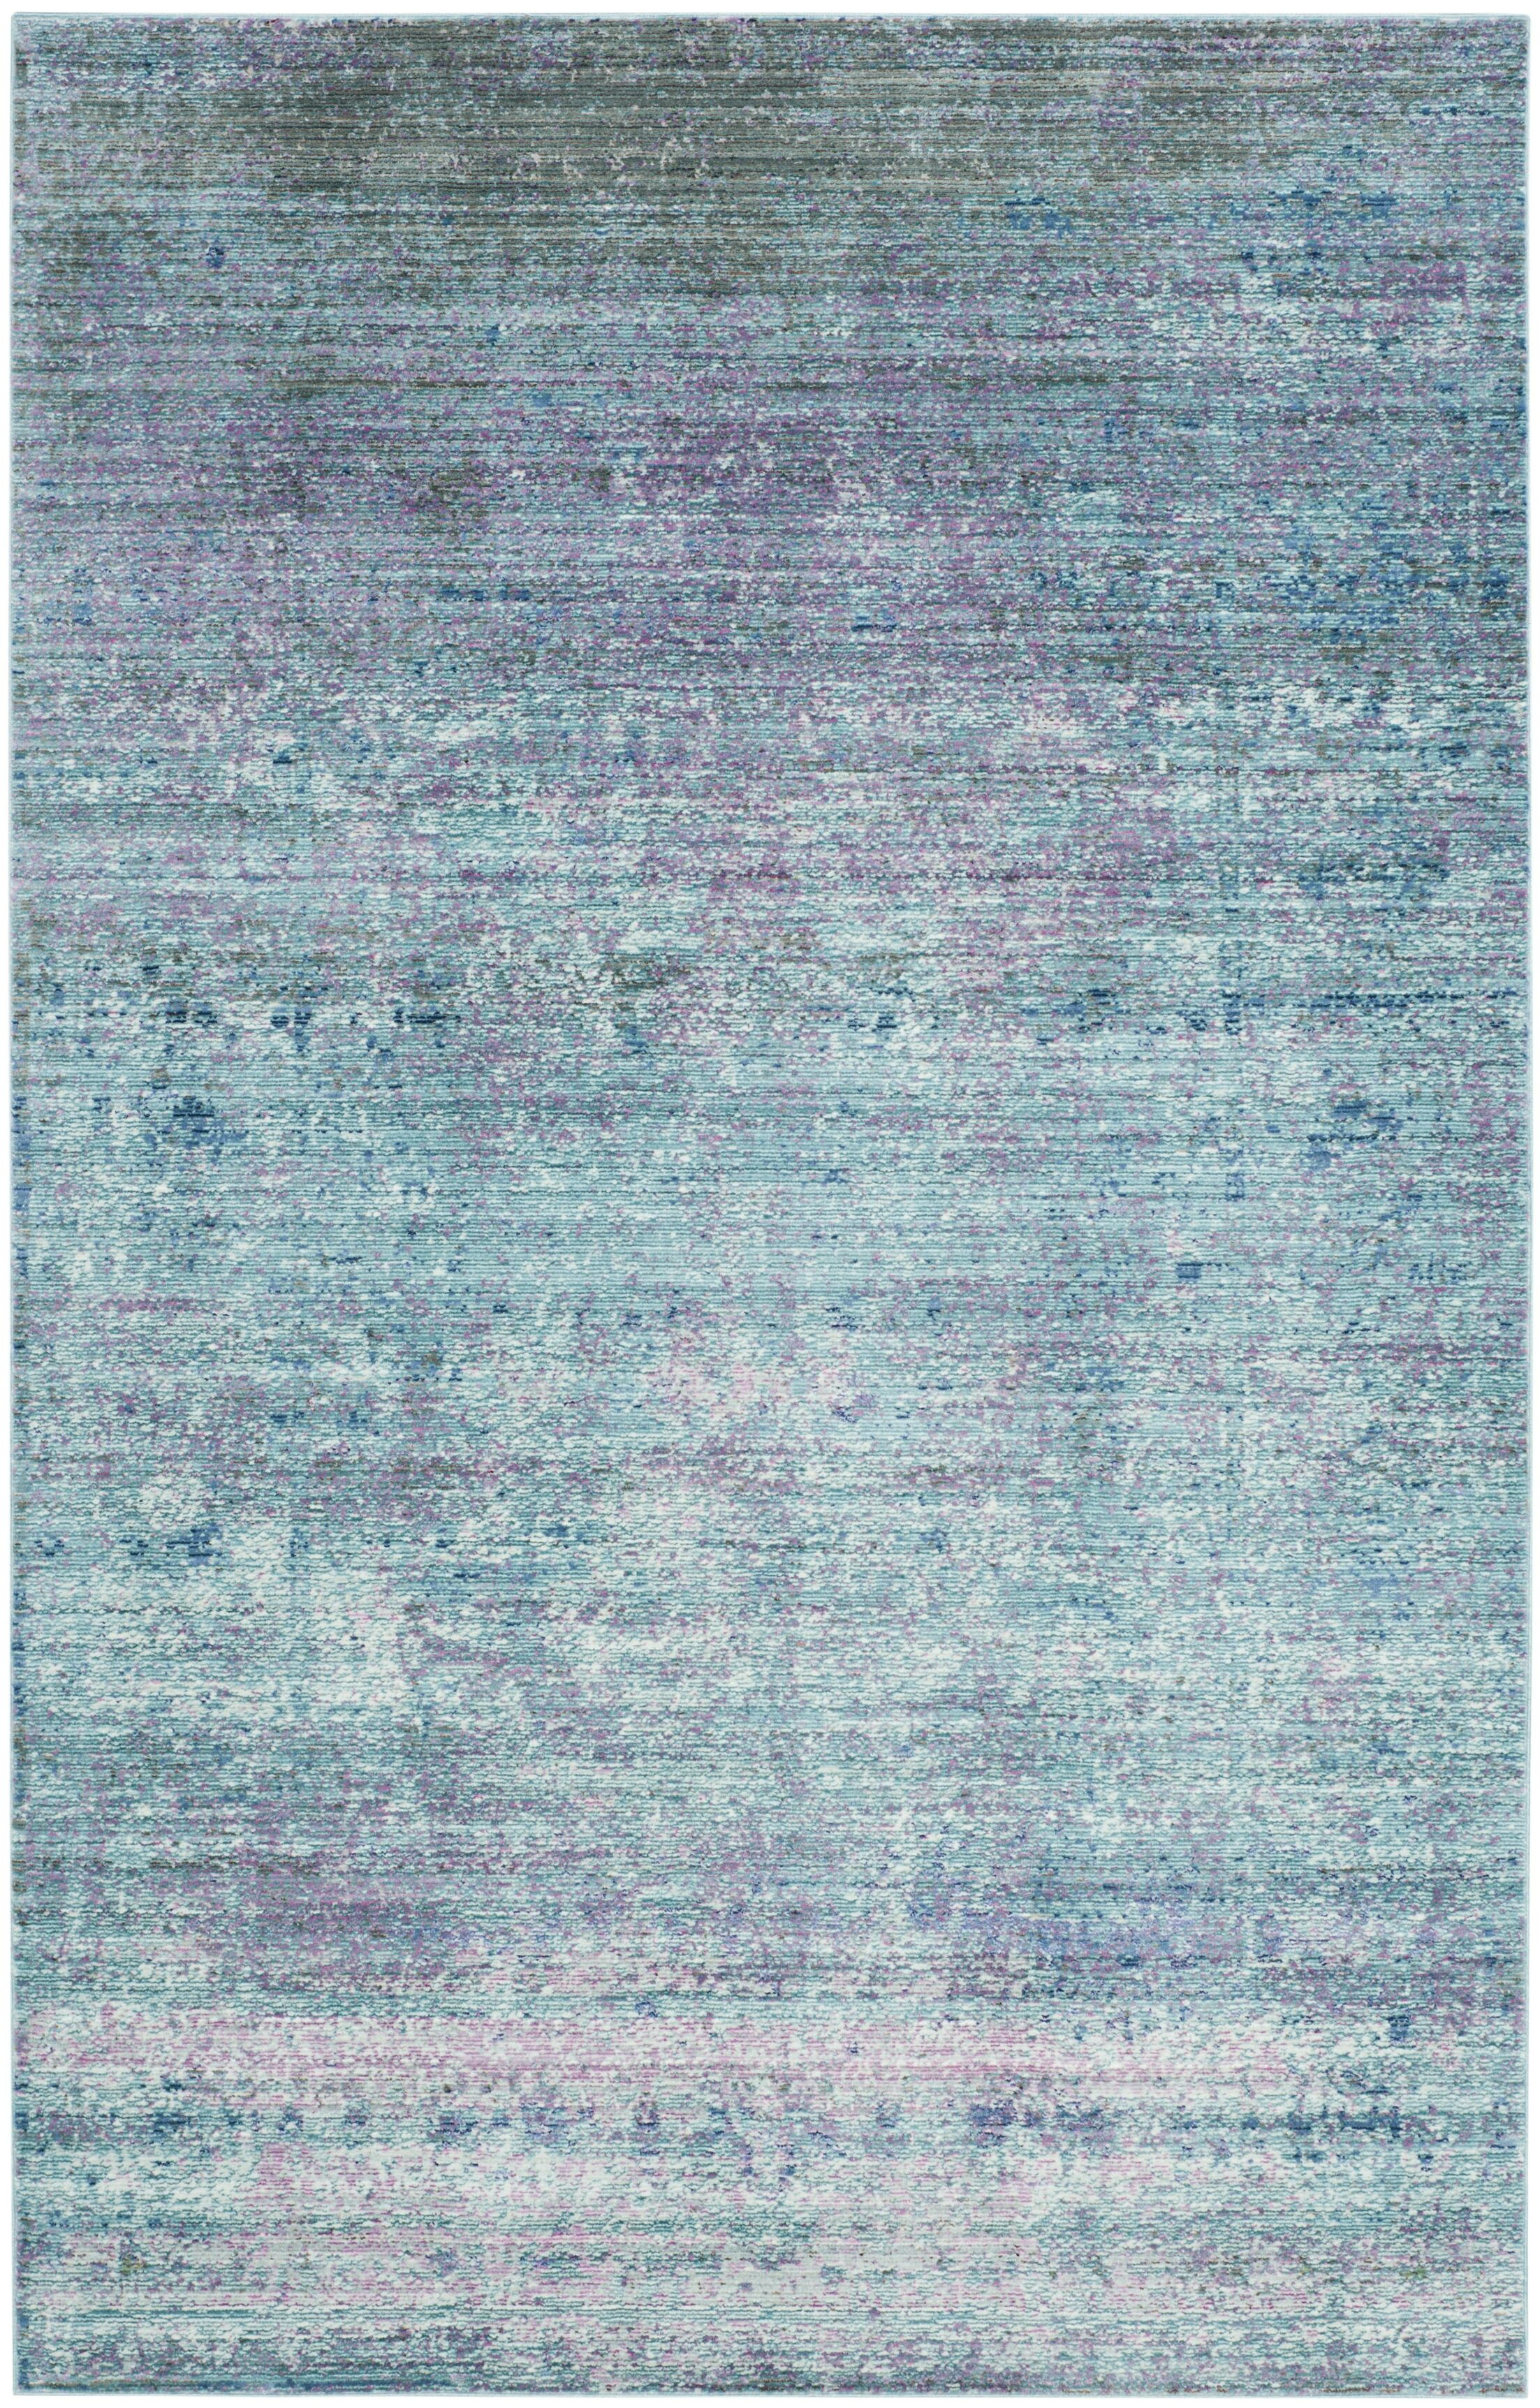 Mulhall Purple/Blue Area Rug Rug Size: Rectangle 9' x 12'